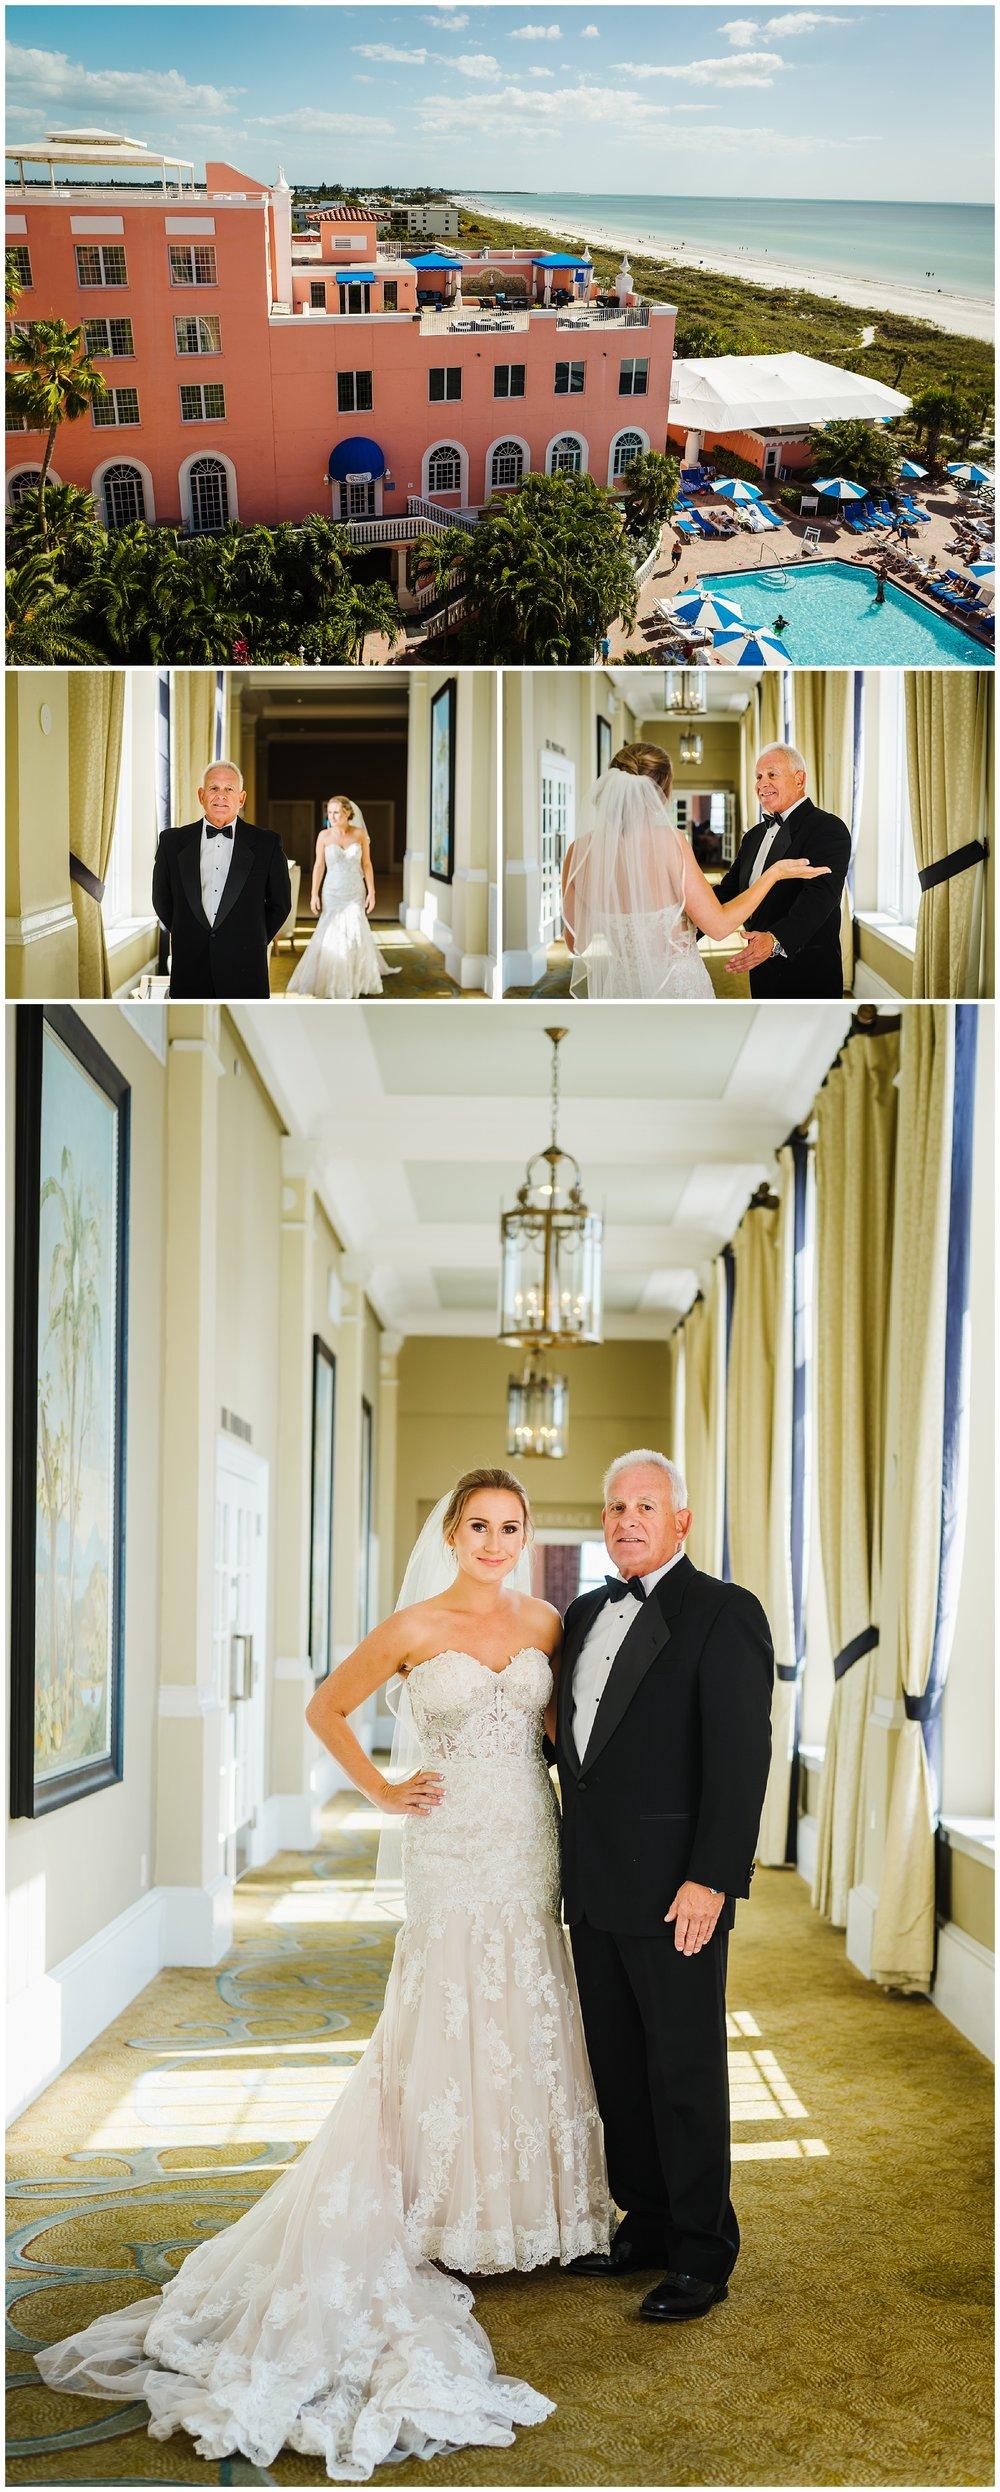 Tampa-wedding-photographer-bella-fleur-orchid-boquet-rsvb-events_0006.jpg